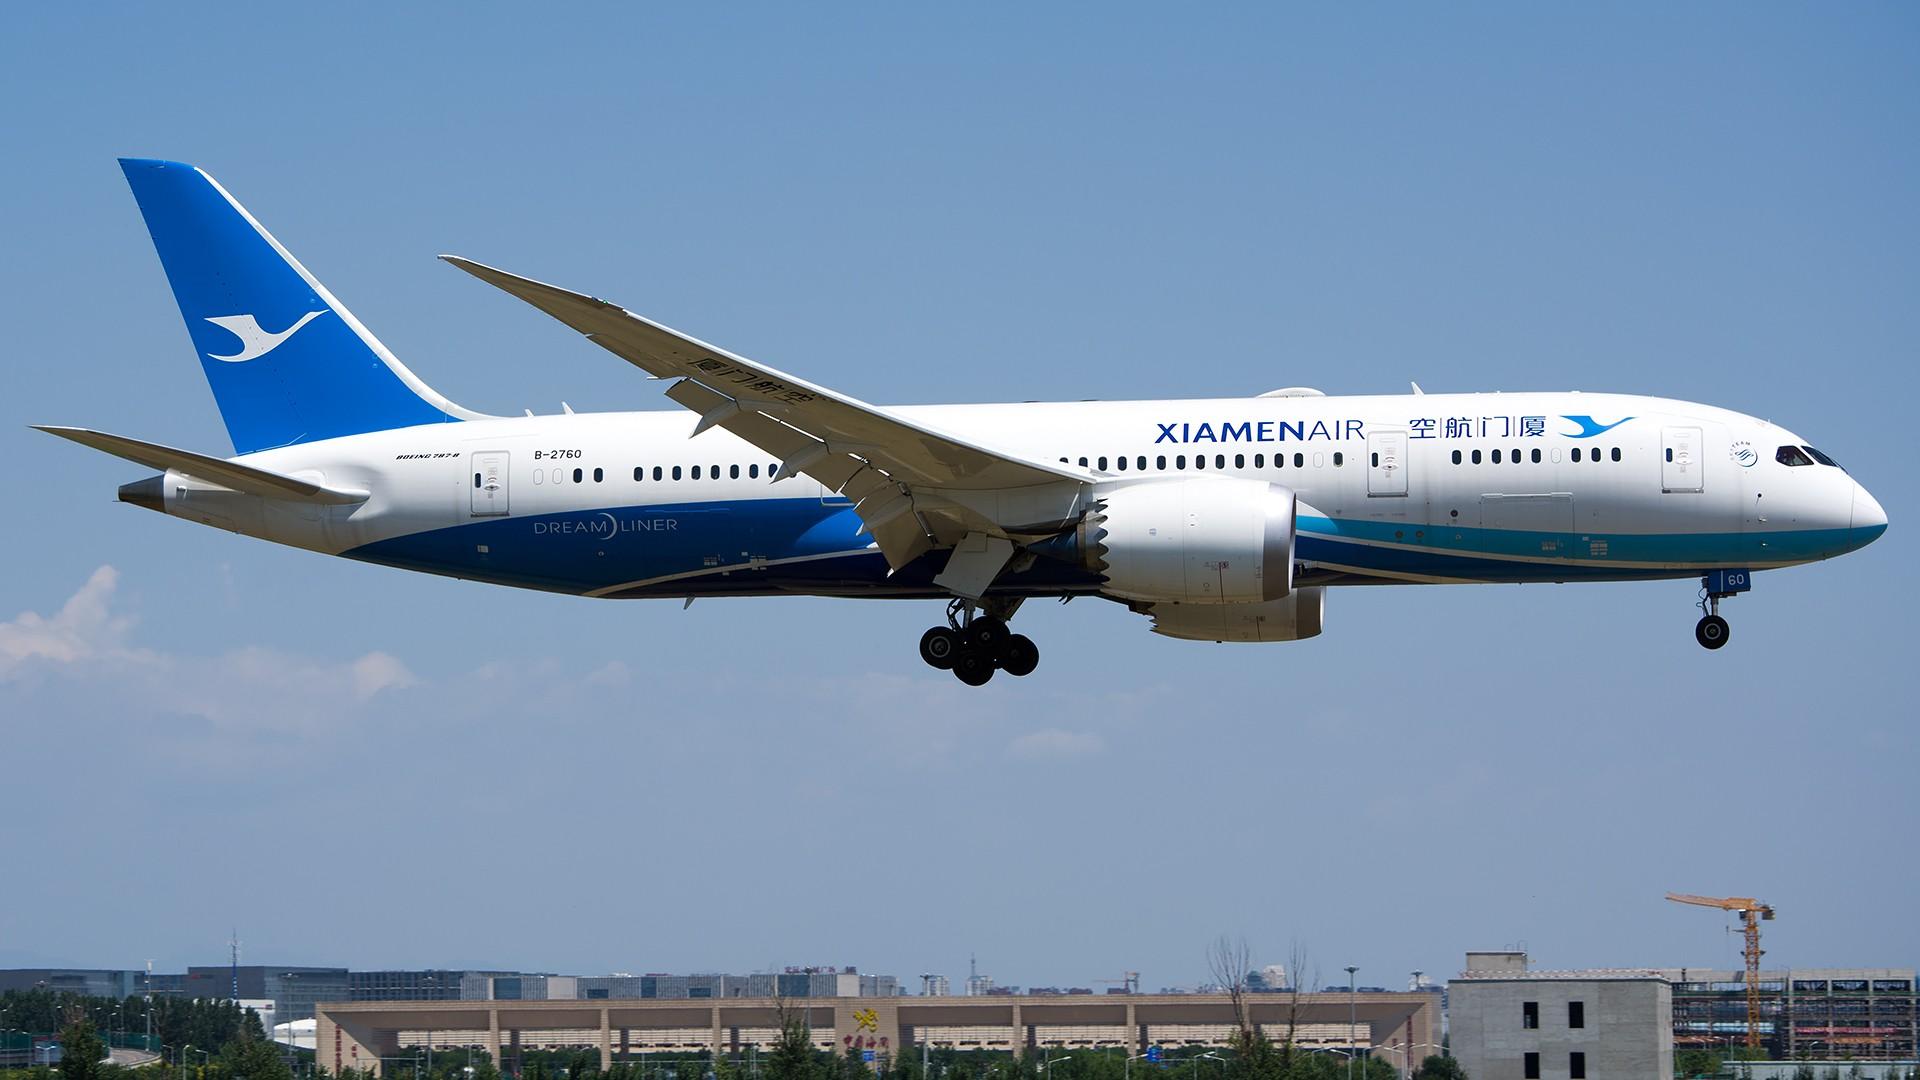 Re:[原创]高空低涡最后一天的PEK杂图【2015-6-14】 BOEING 787-8 B-2760 中国北京首都国际机场